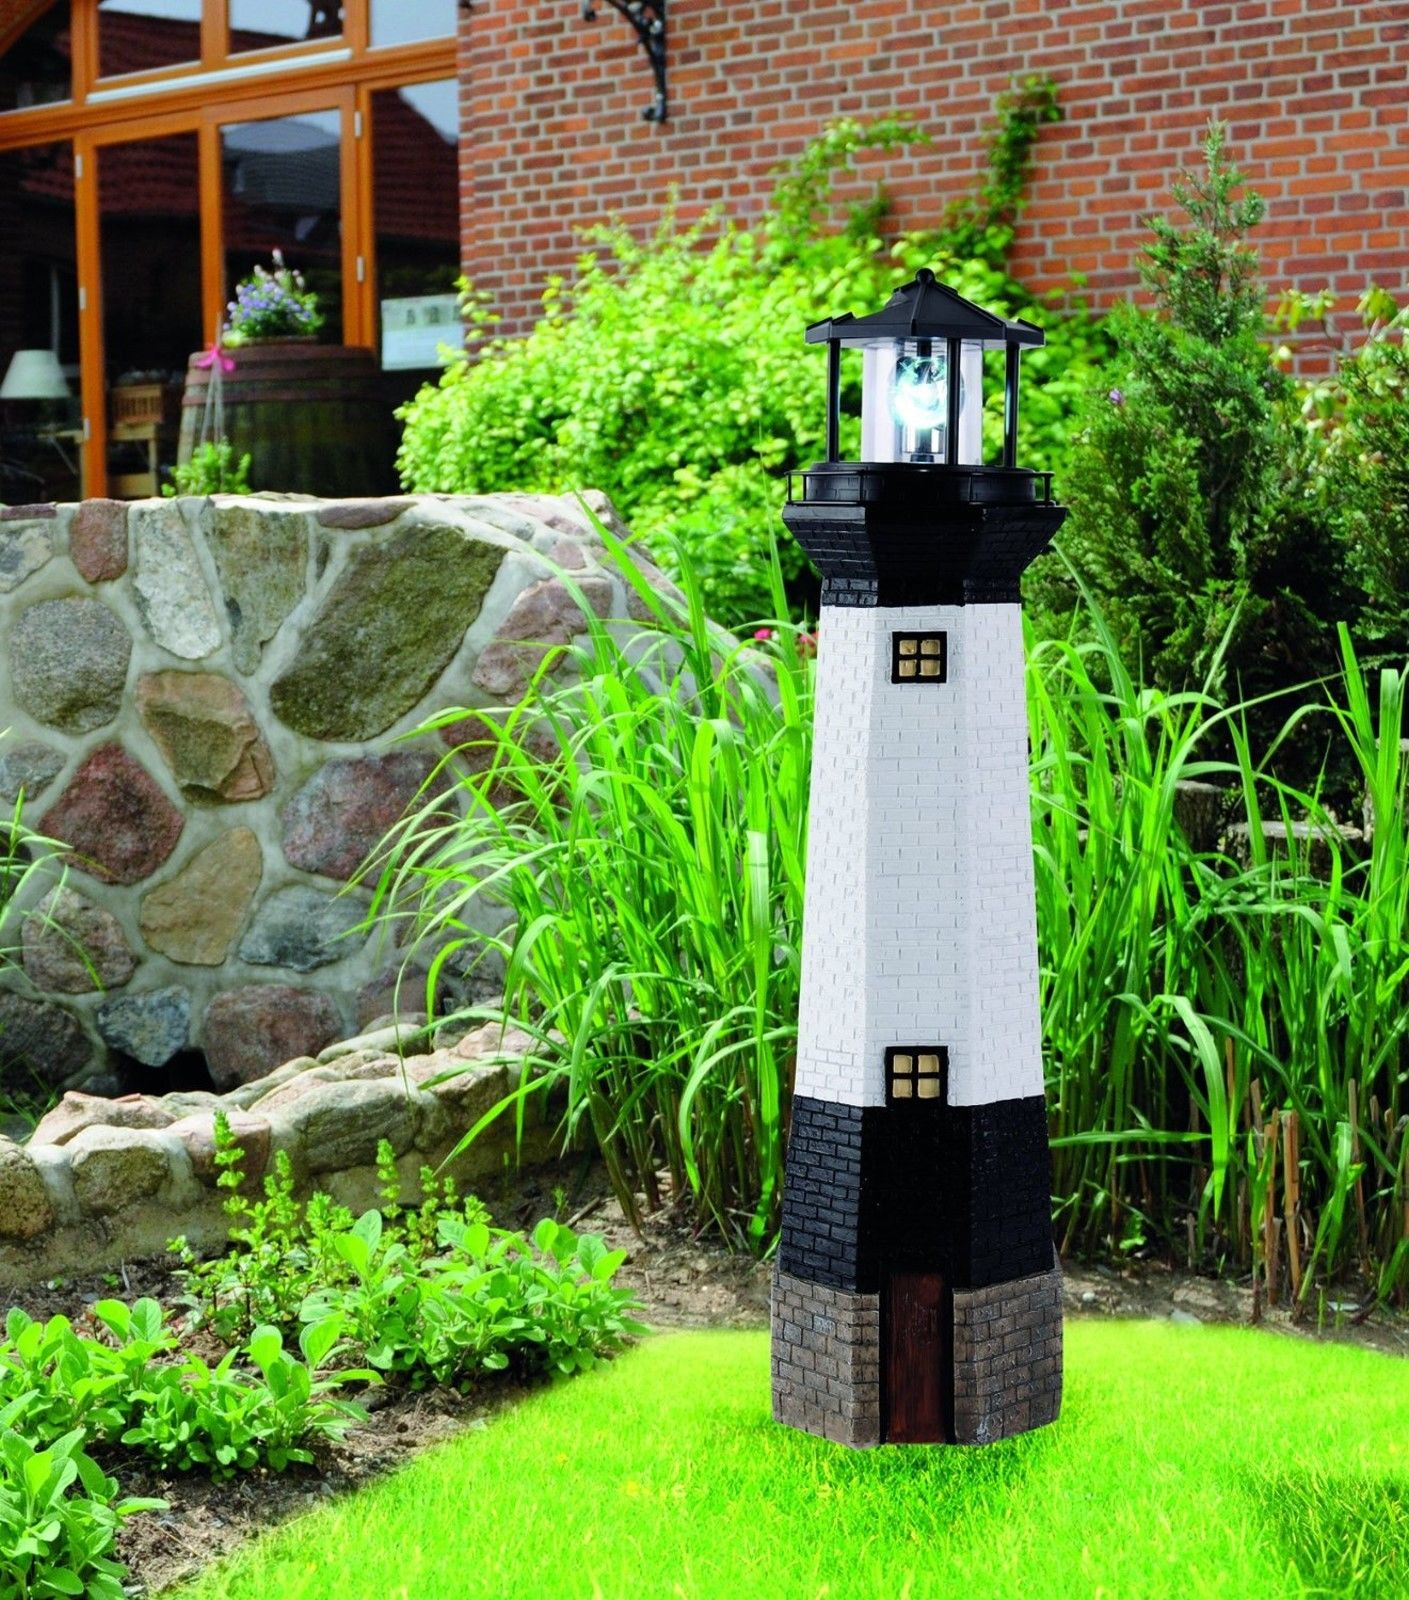 solar 102cm leuchtturm rundum solarbeleuchtung garten beleuchtung solarleuchte 4250303813753 ebay. Black Bedroom Furniture Sets. Home Design Ideas